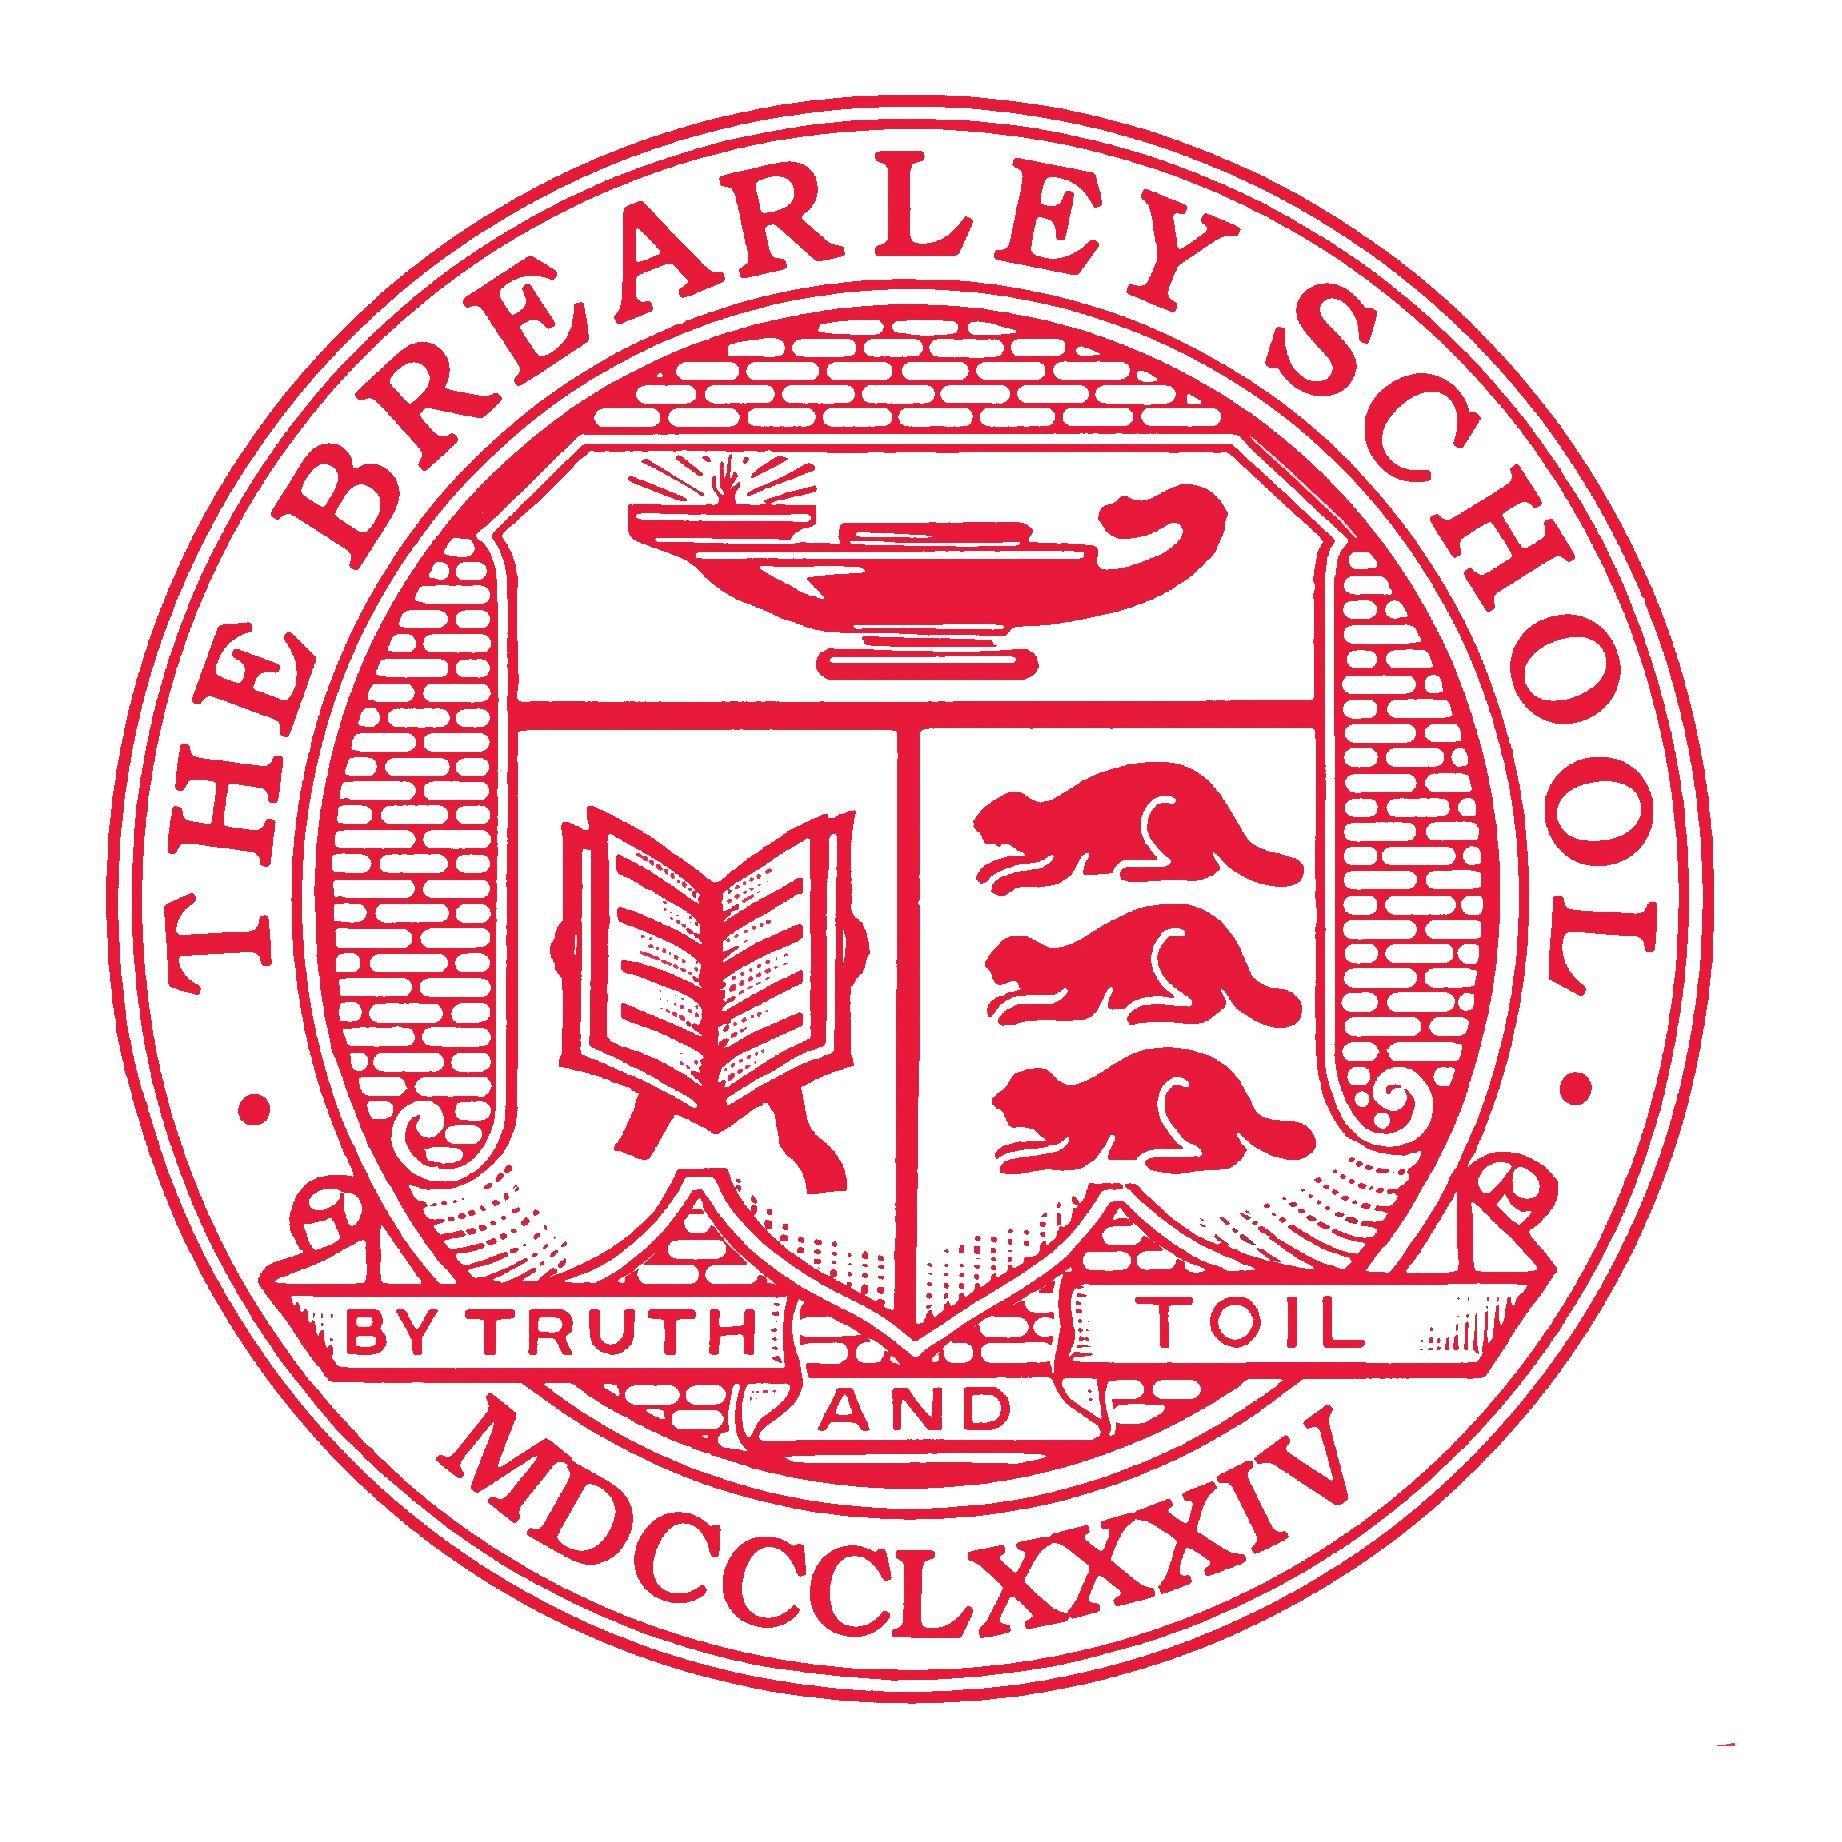 Brearley .jpeg